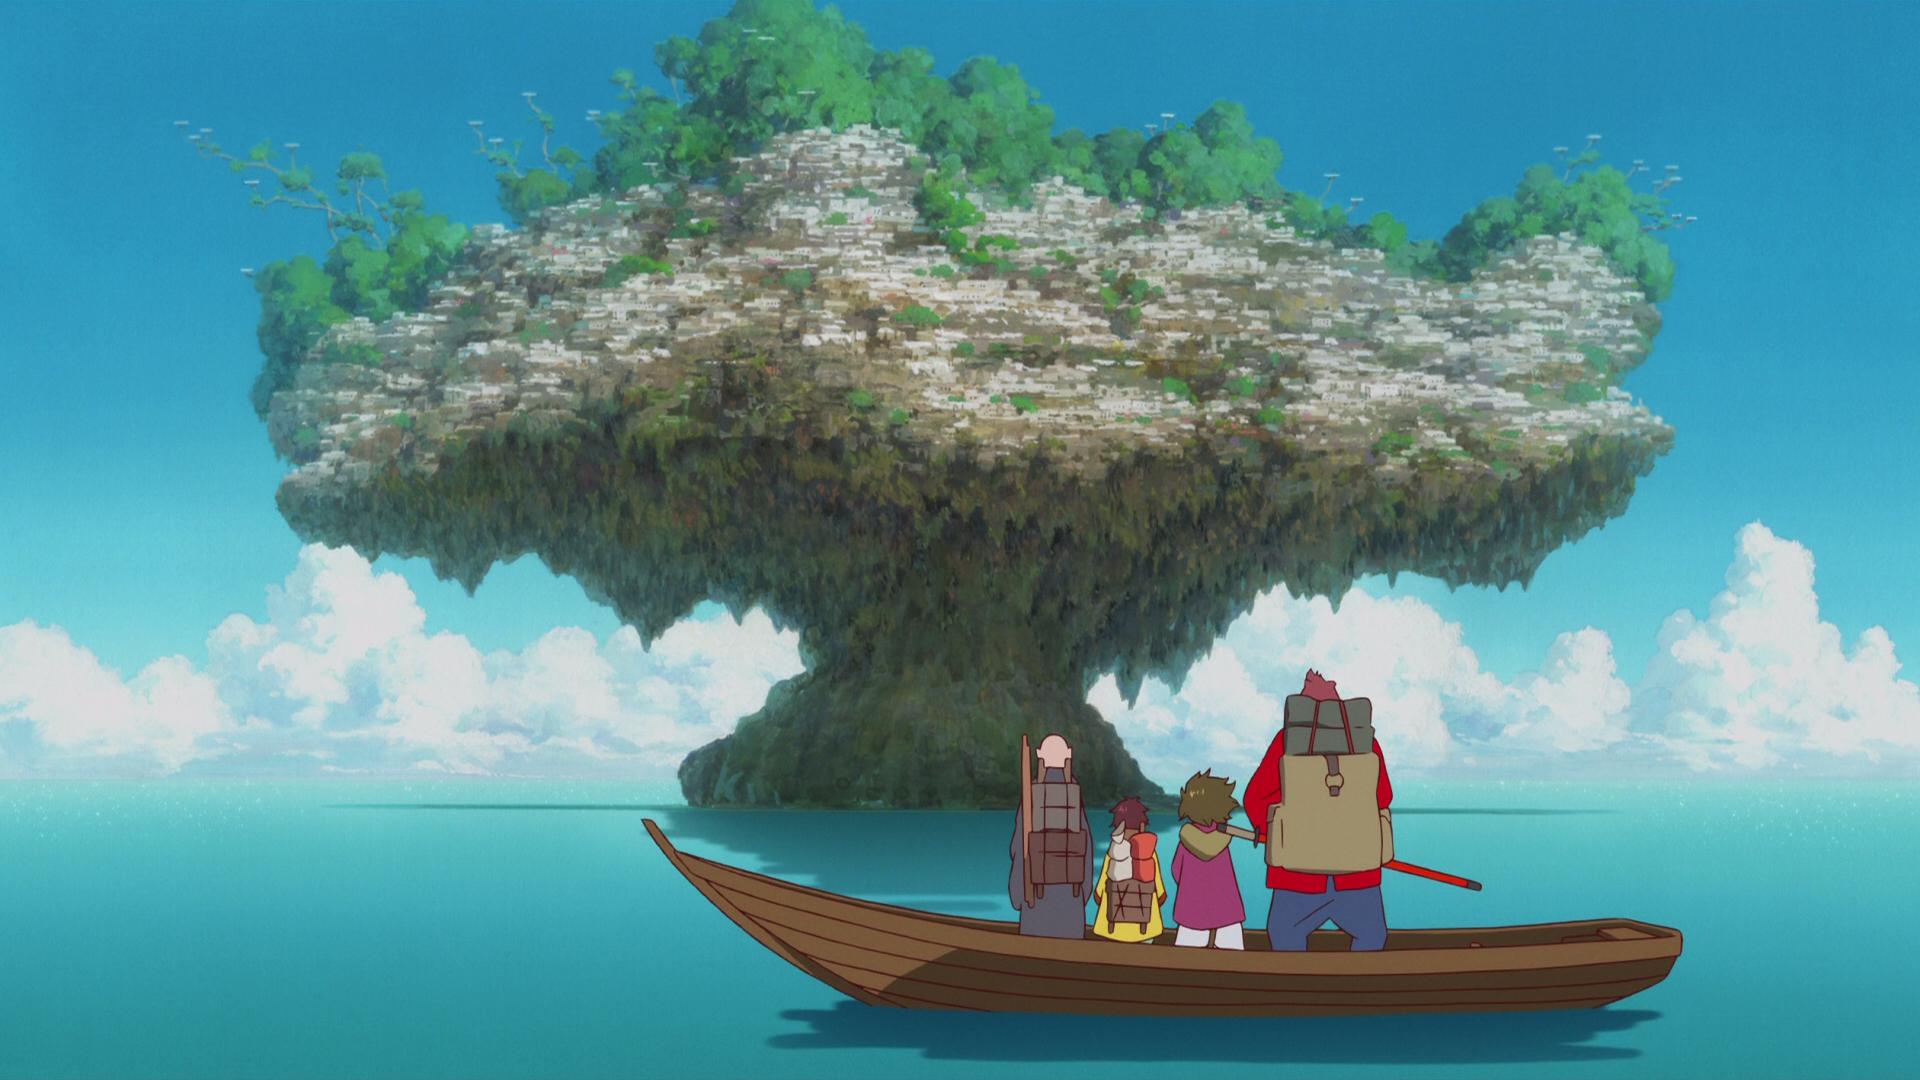 On The Boat Bakemono No Ko Fondo De Pantalla Hd Fondo De